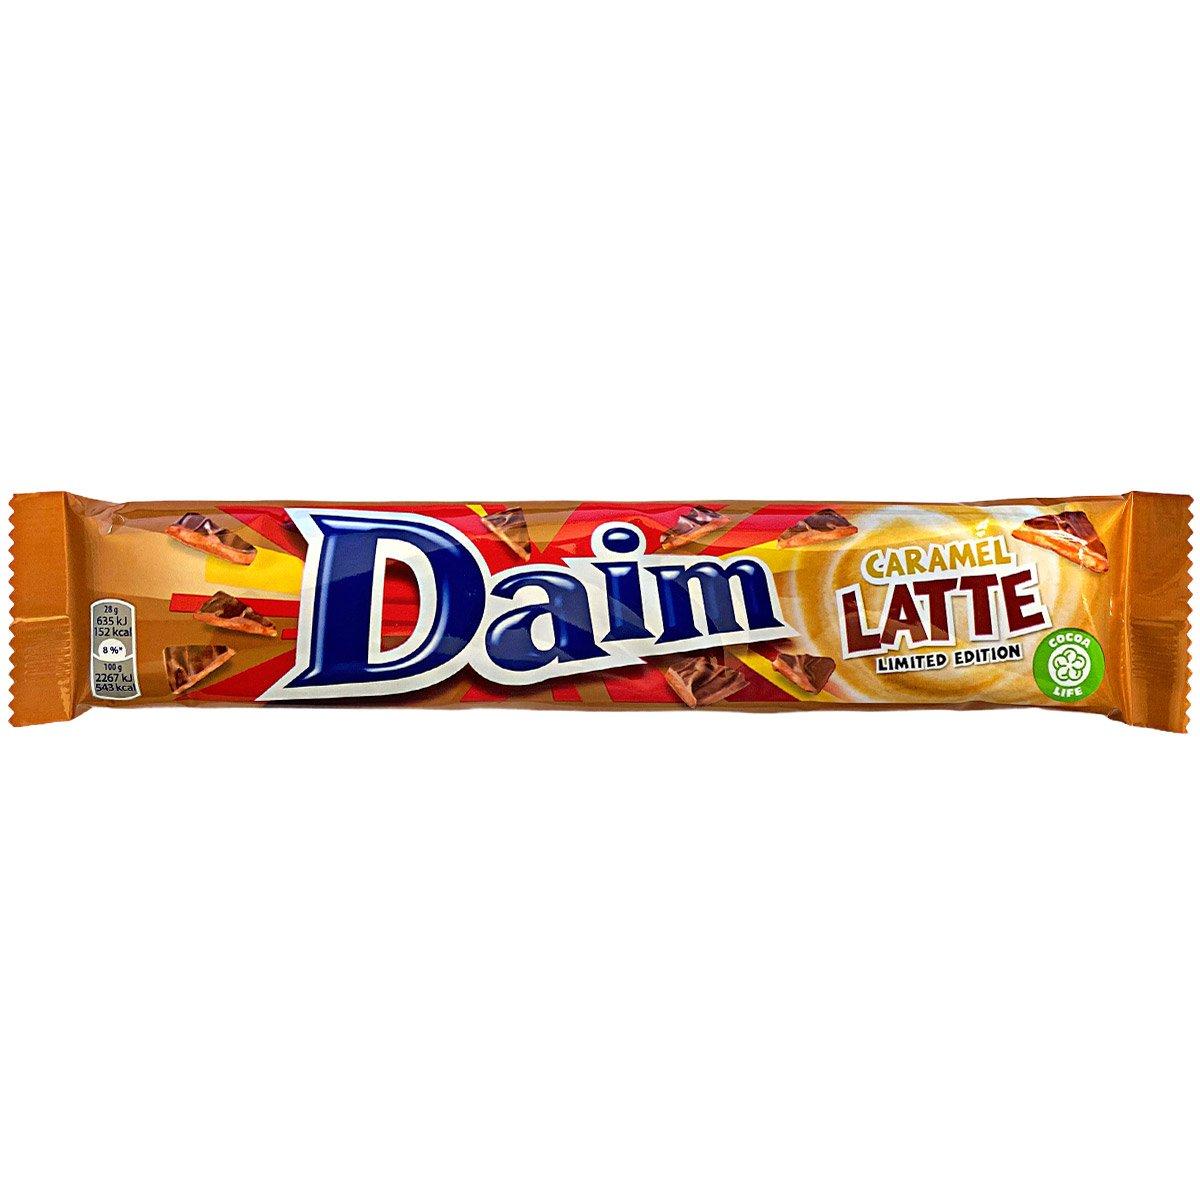 Daim Caramel Latte Chocolate Limited Edition (28g) 1